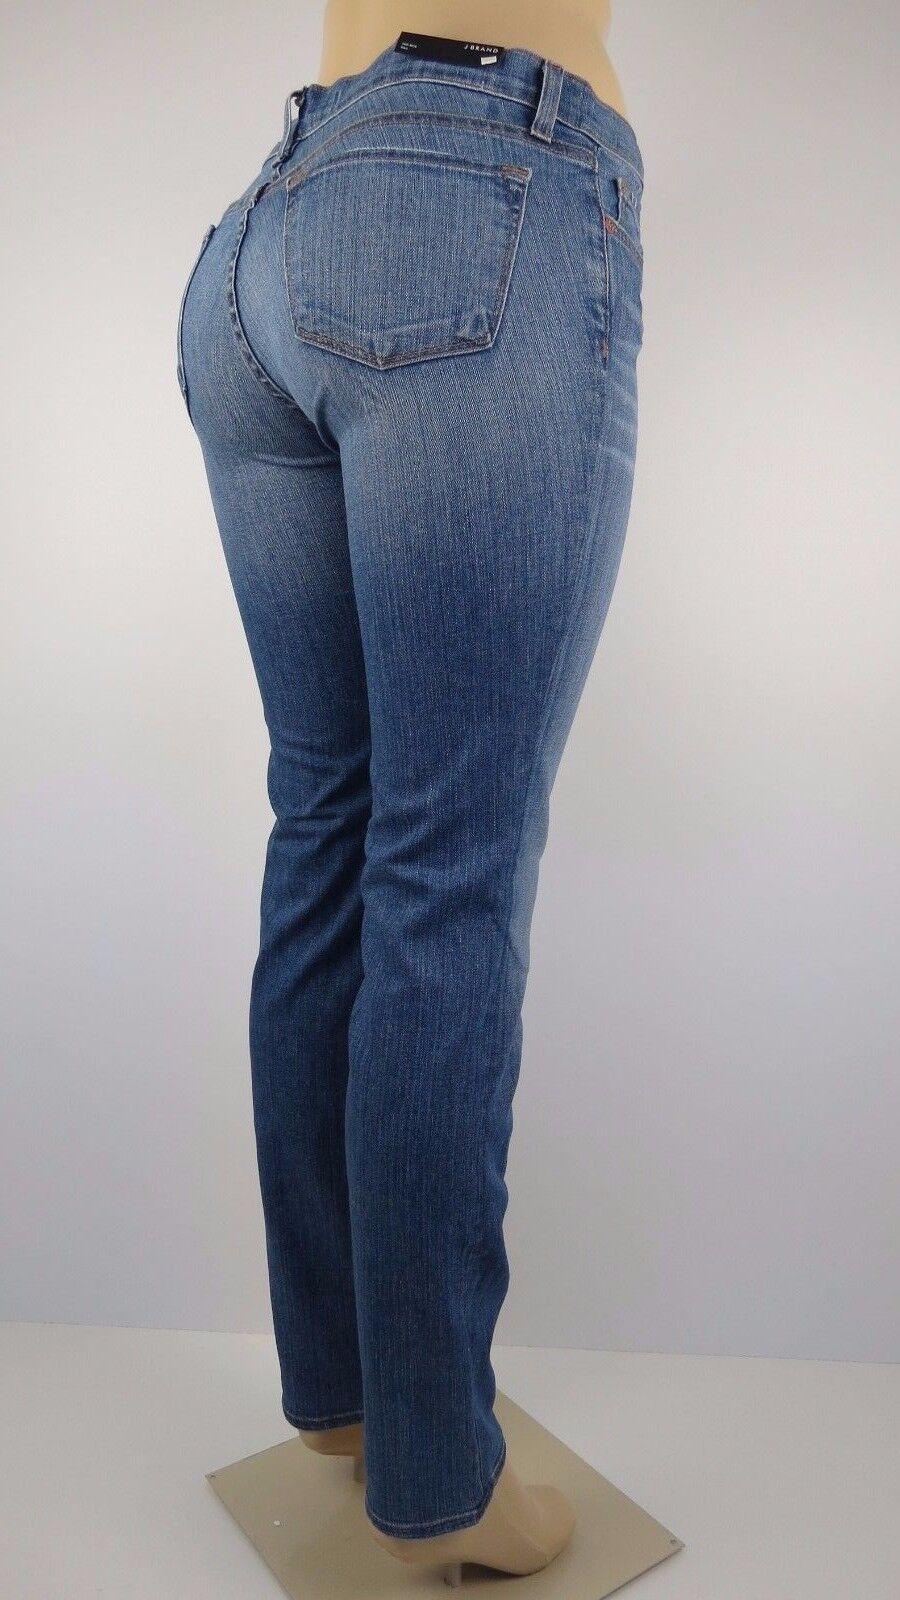 NWT J BRAND WOMENS JEANS STRAIGHT LEG, RAIL, BLISS, Size 25,Retail  198